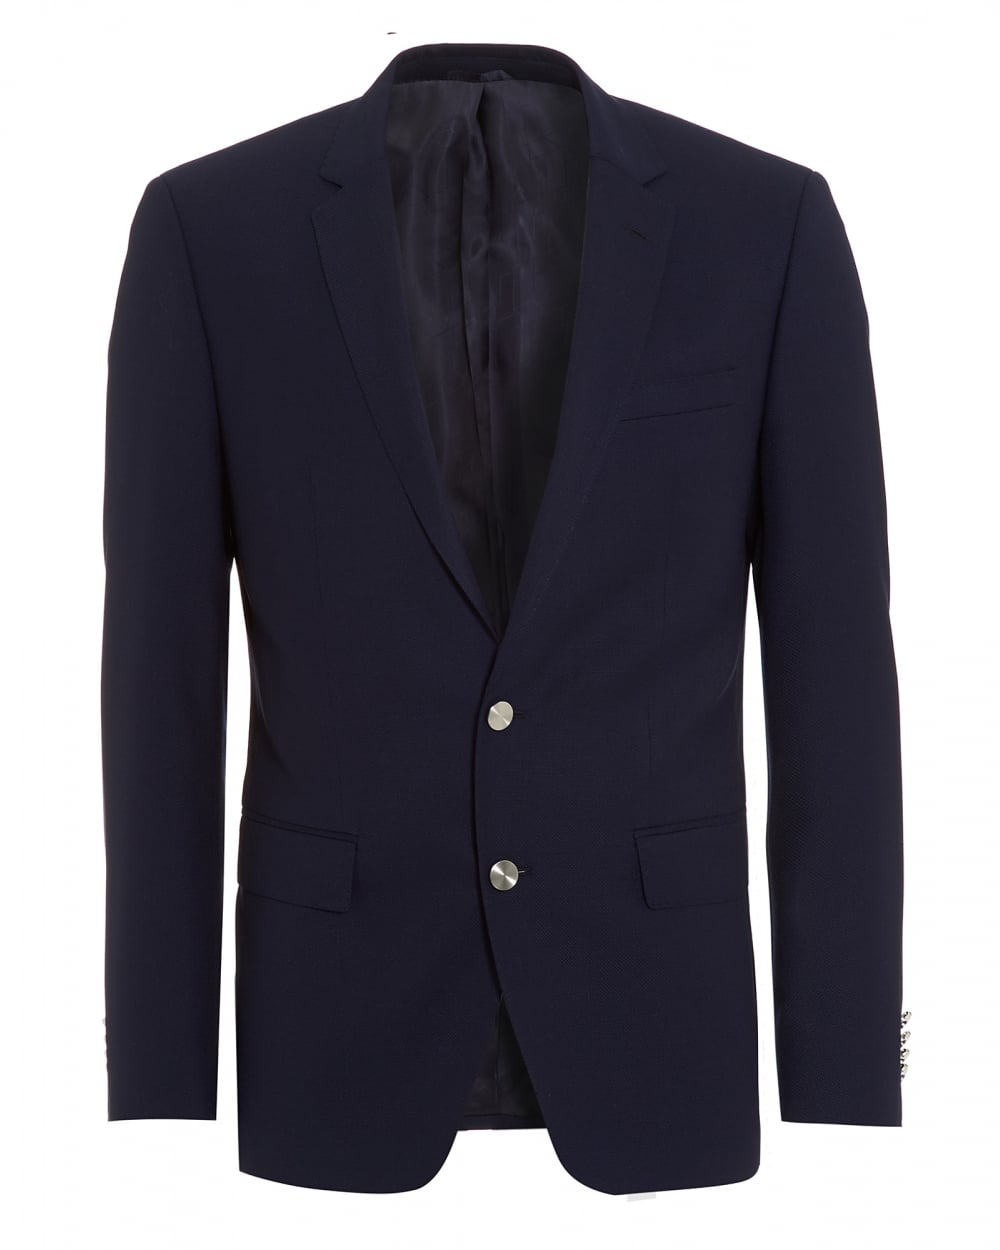 a658d7ae928 Hugo Boss Classic Mens Hanston Jacket, Navy Blue Metal Button Slim Fi